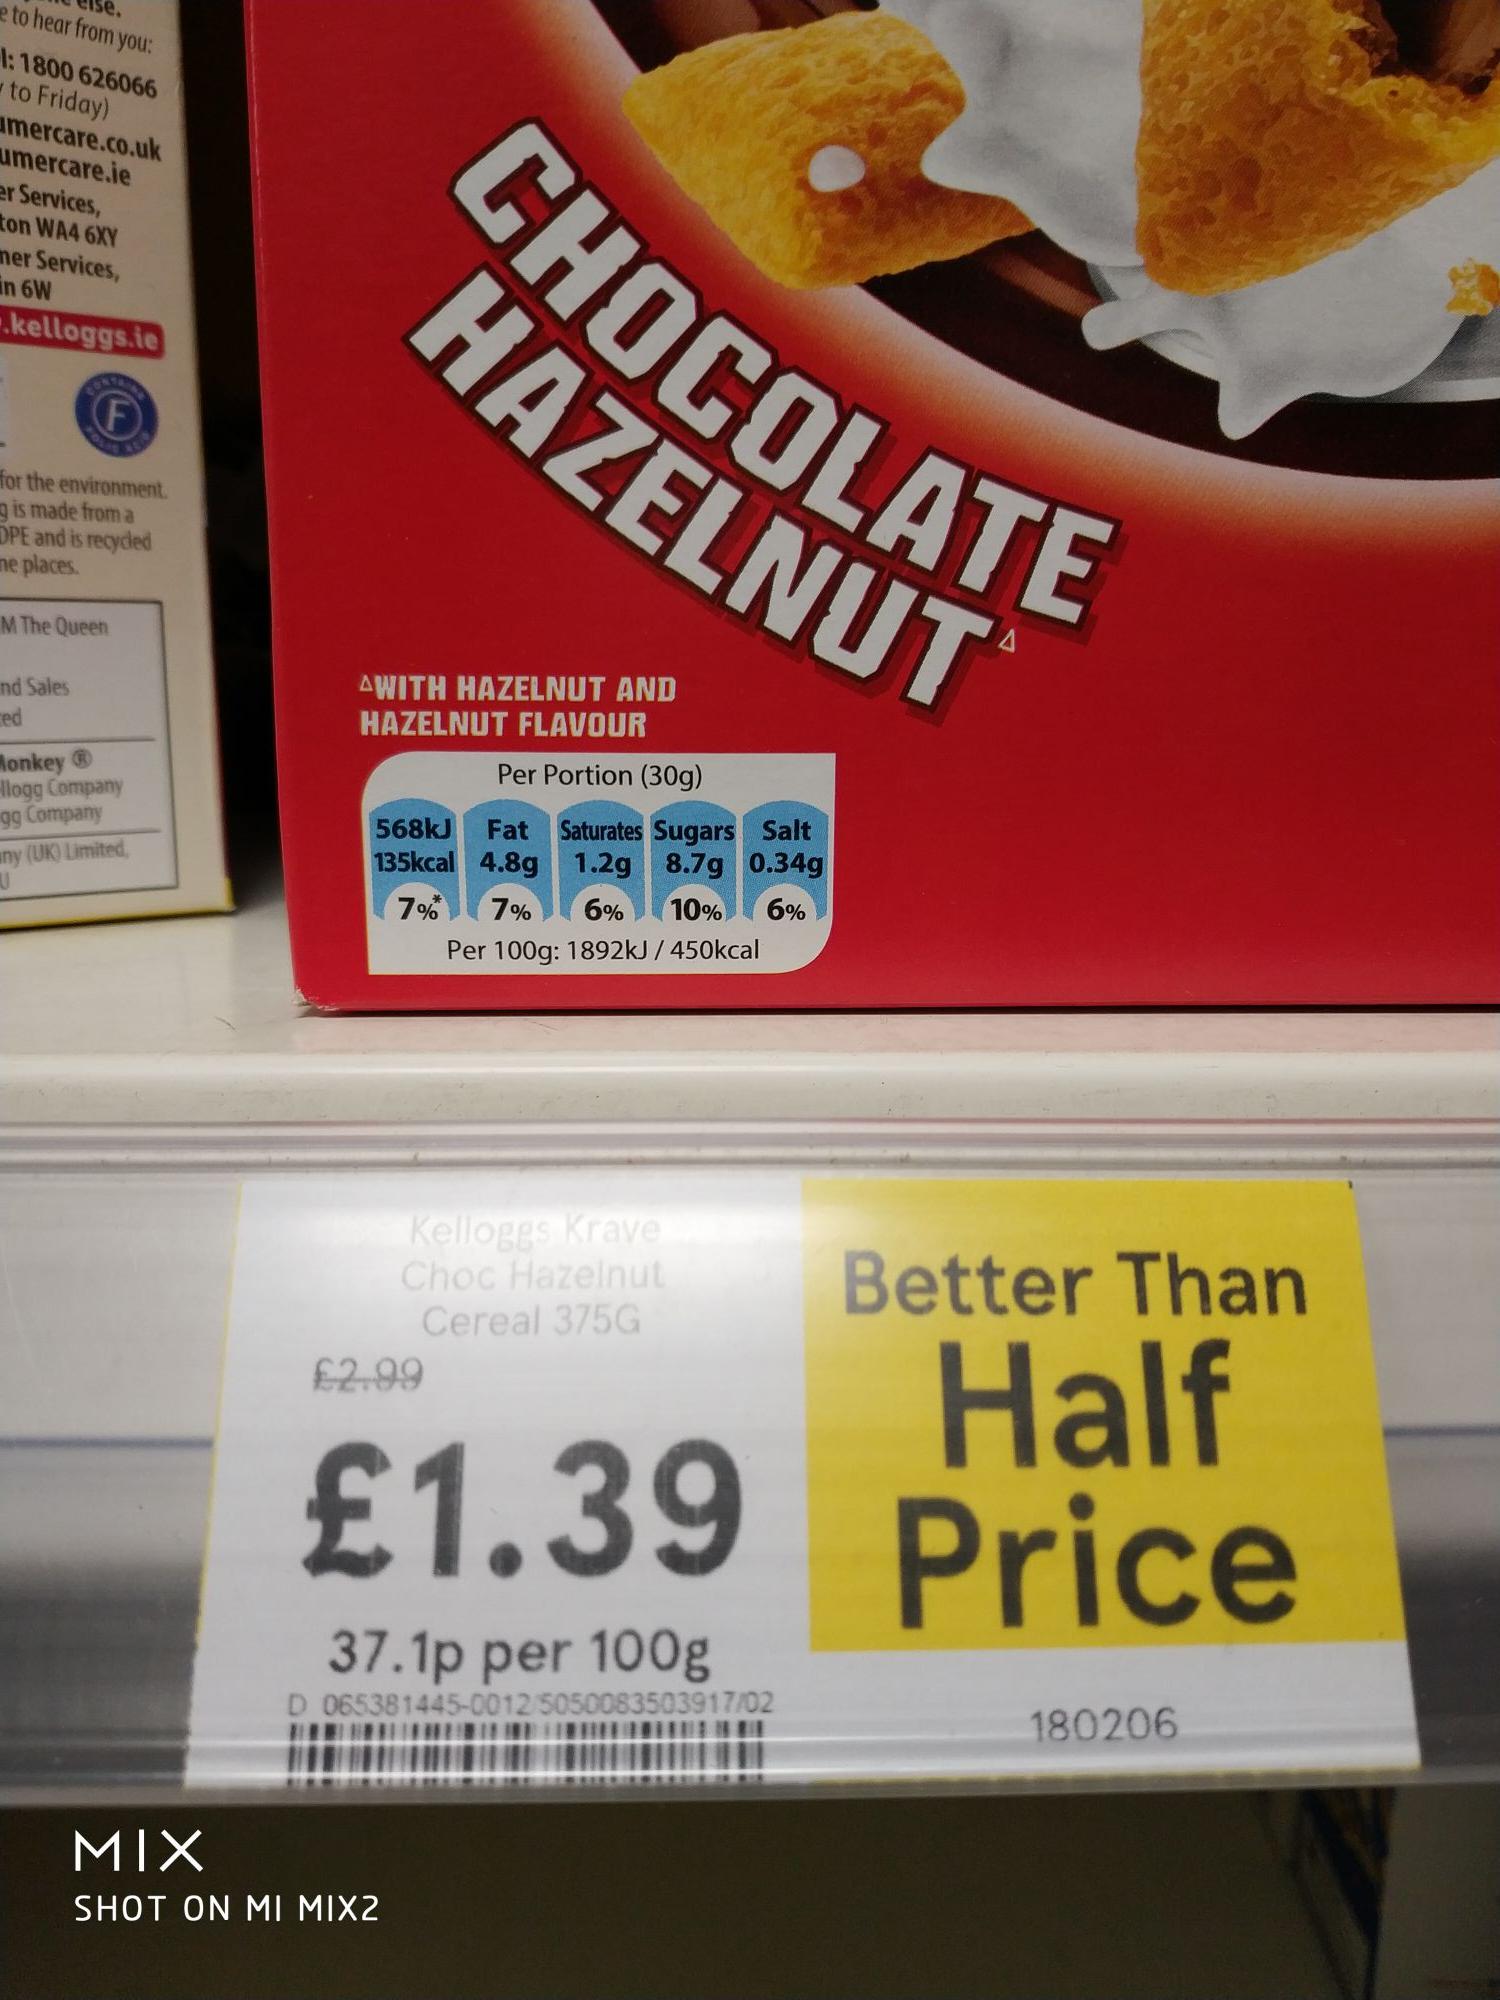 Kellogg's Krave Chocolate Hazelnut cereal - £1.39 instore @ Tesco